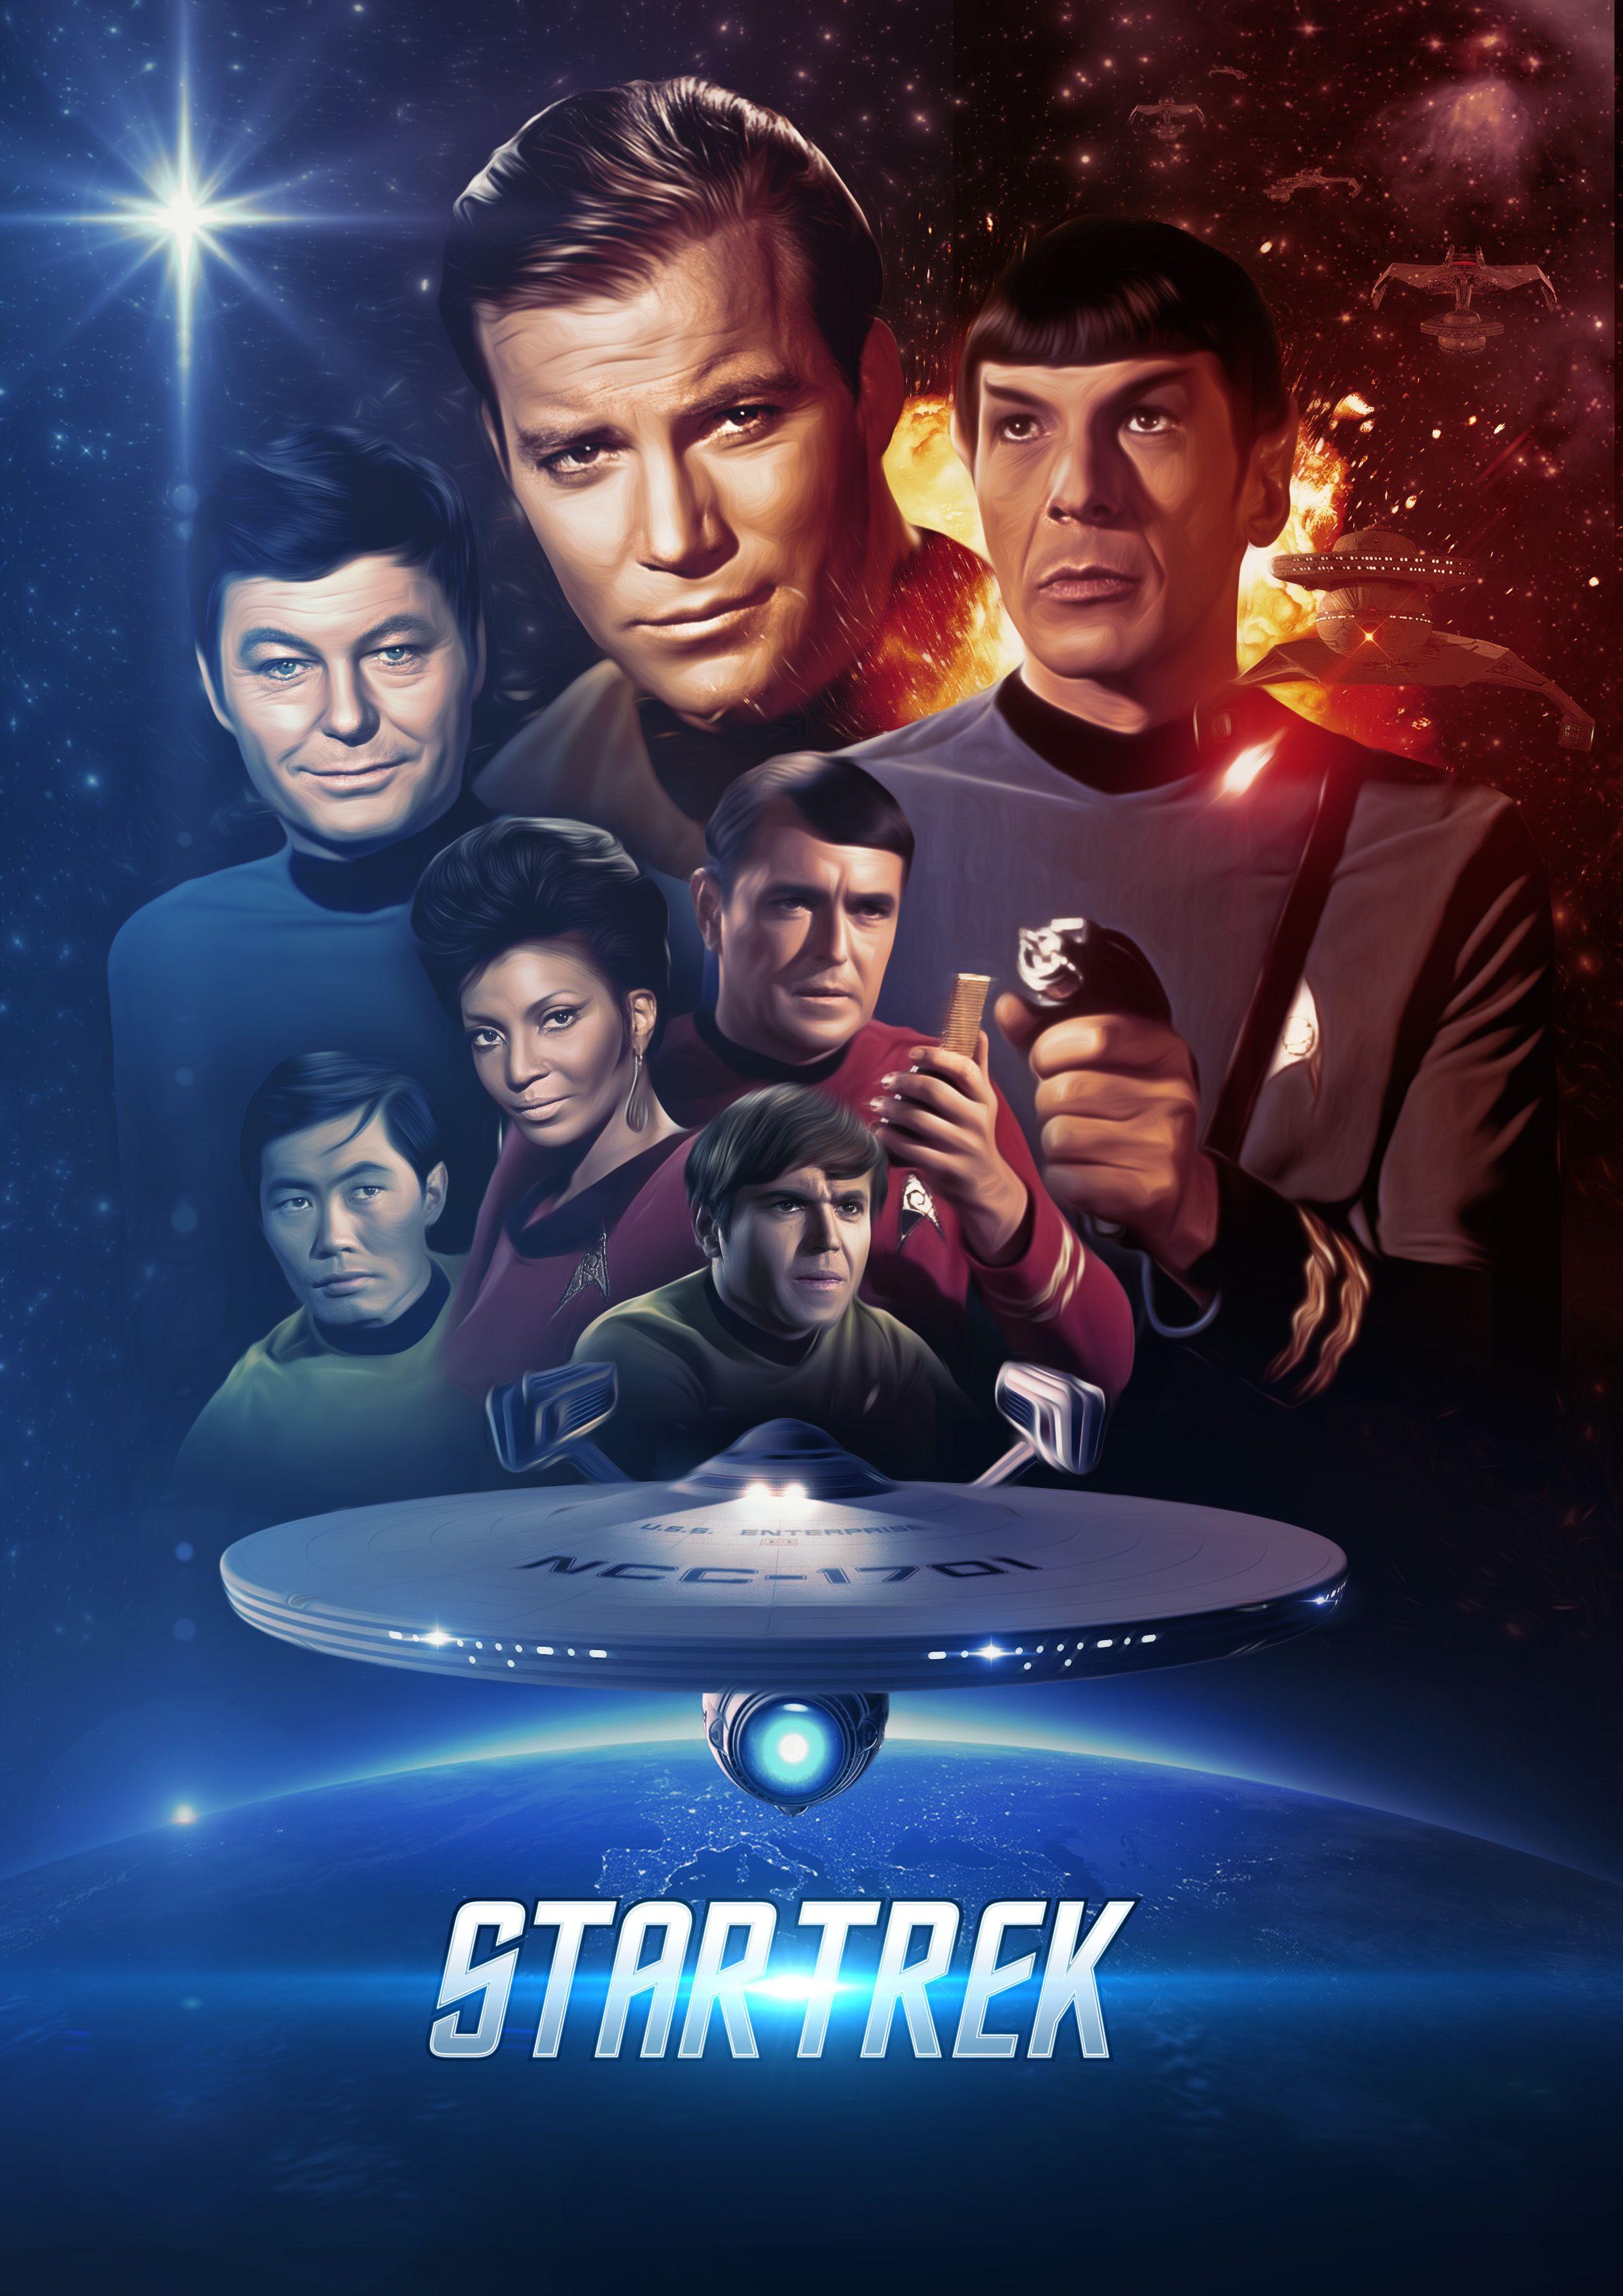 Star Trek James T Kirk Enterprise Picture Movie Poster Film Cinema Picture